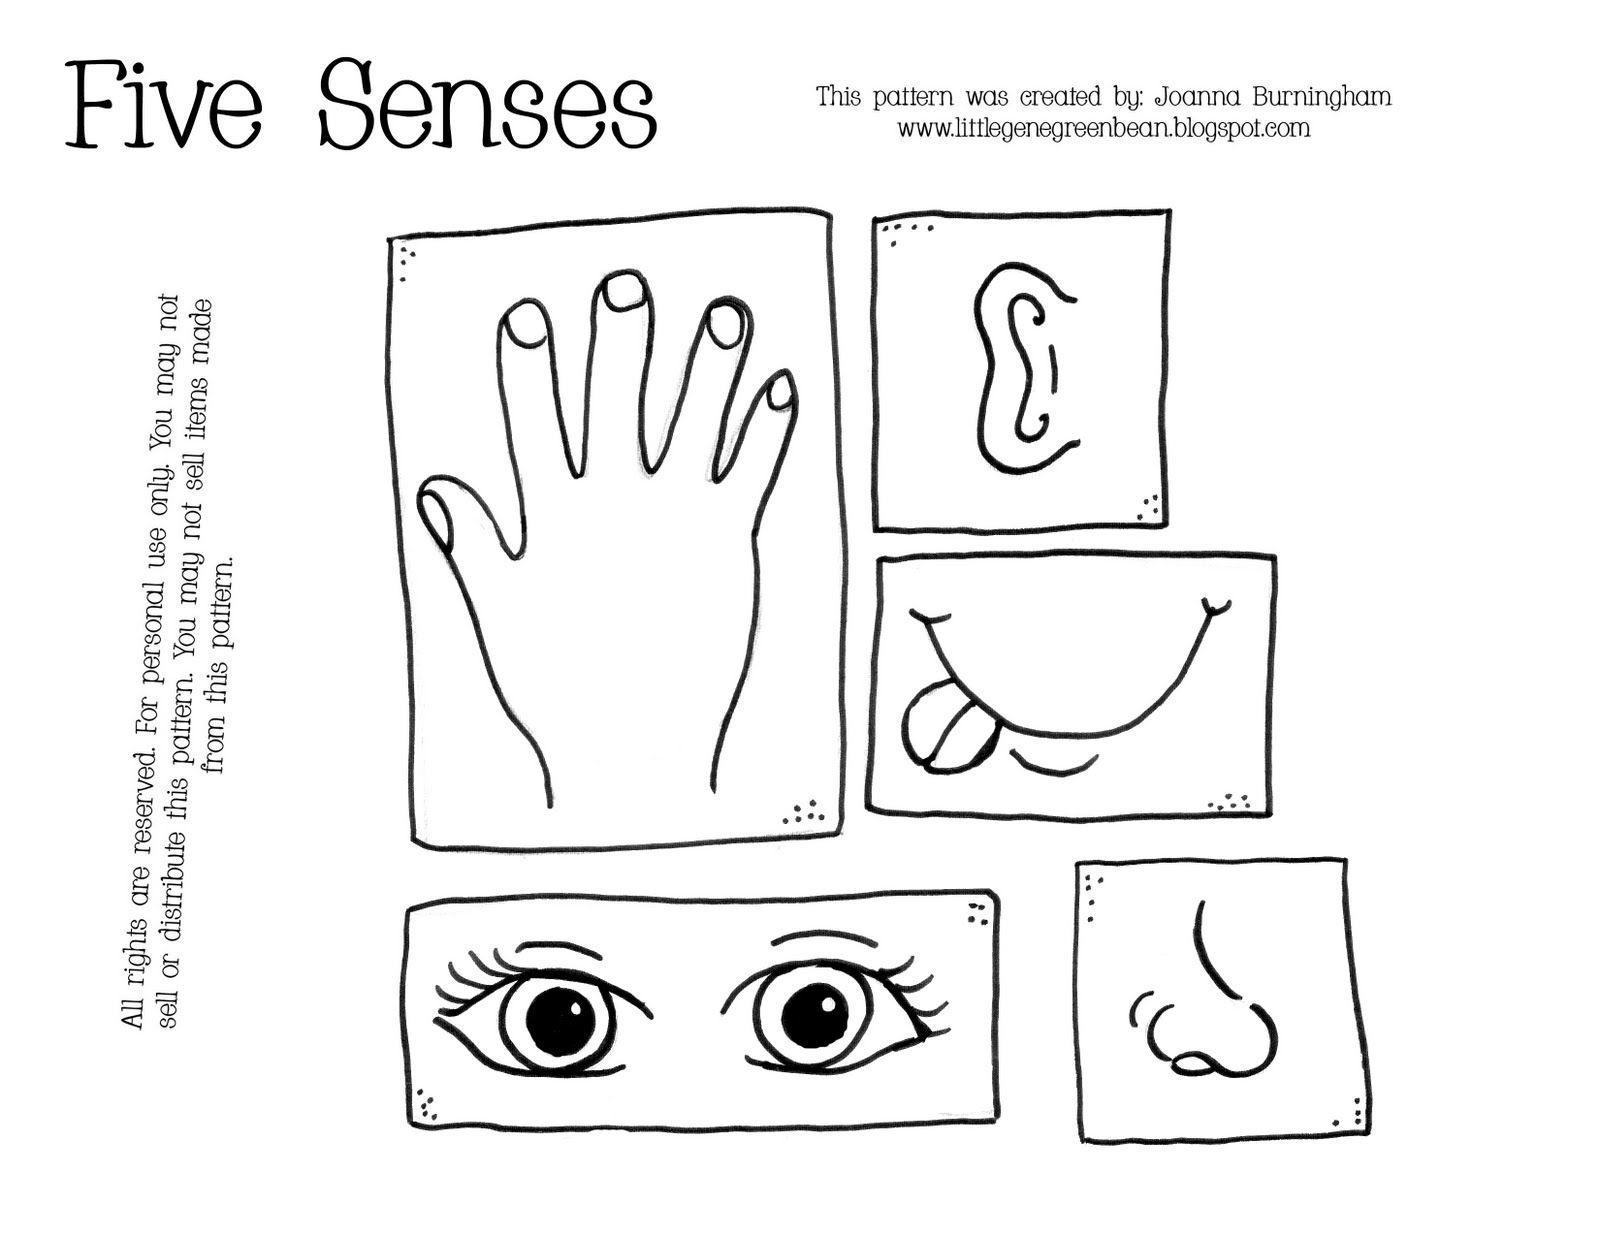 Five senses coloring pages preschool for Five senses coloring pages